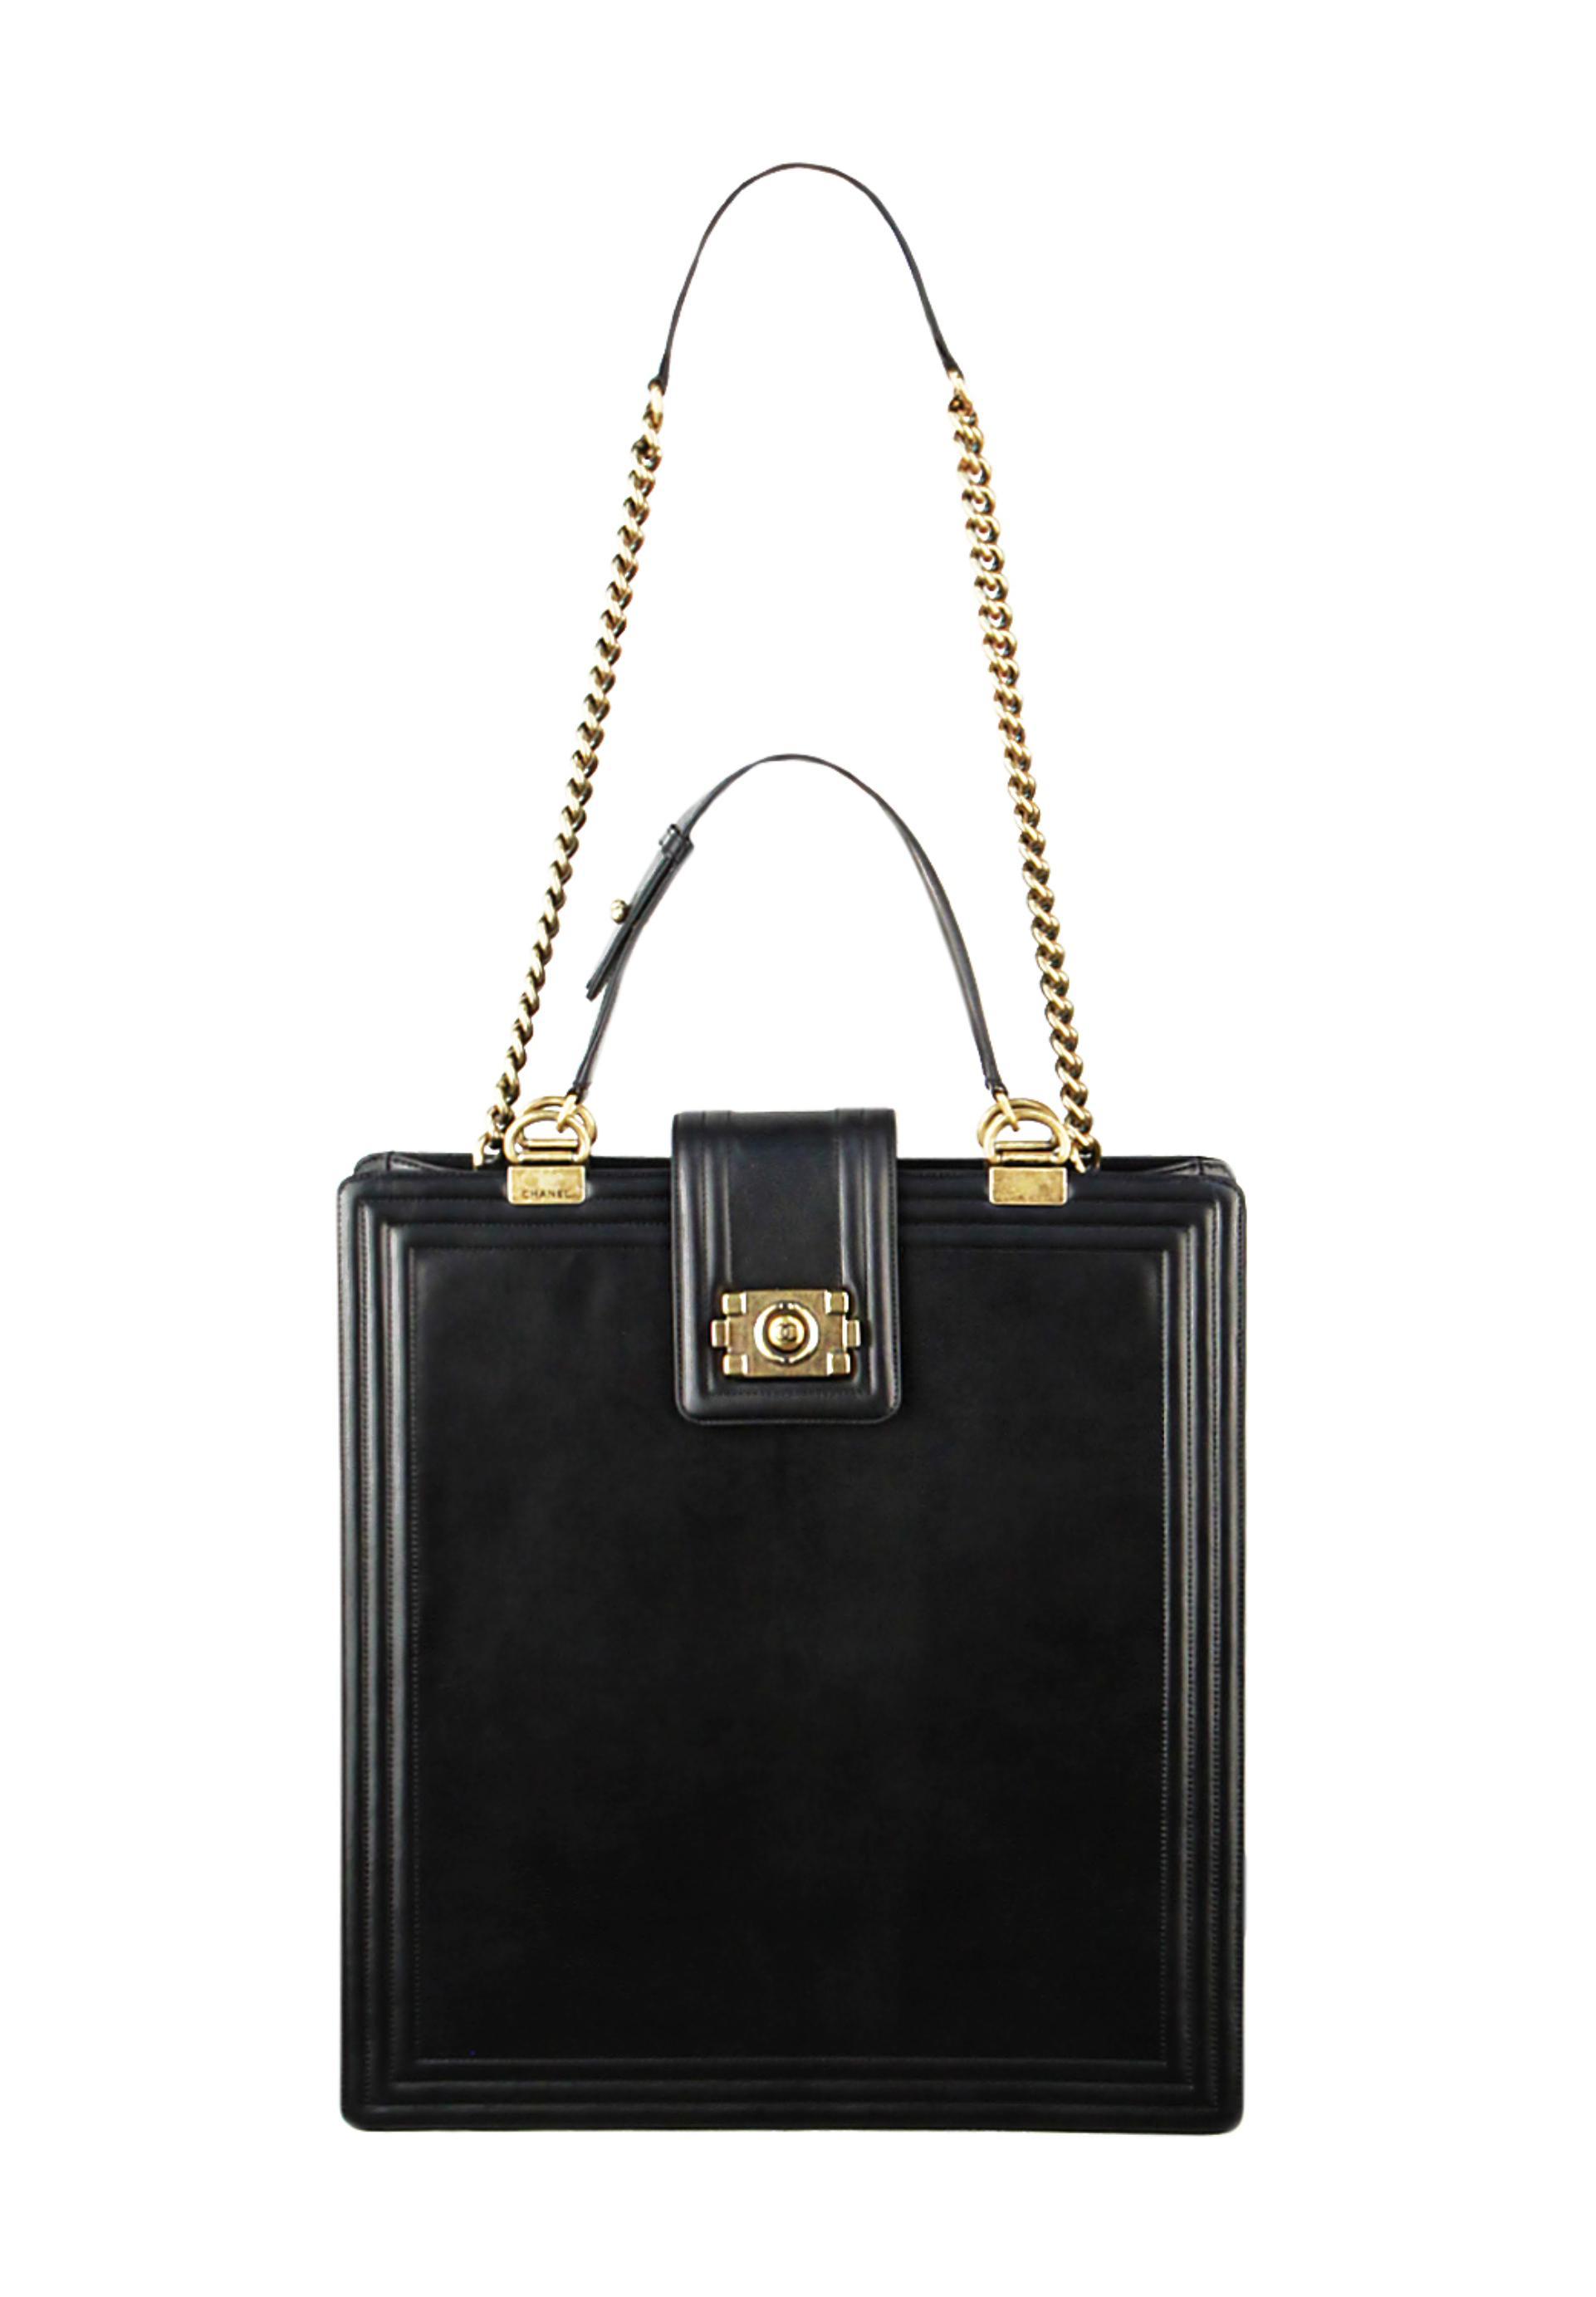 8924c337e193 Chanel Premiere Watch Bag · Chanel Tote Black Bag ...